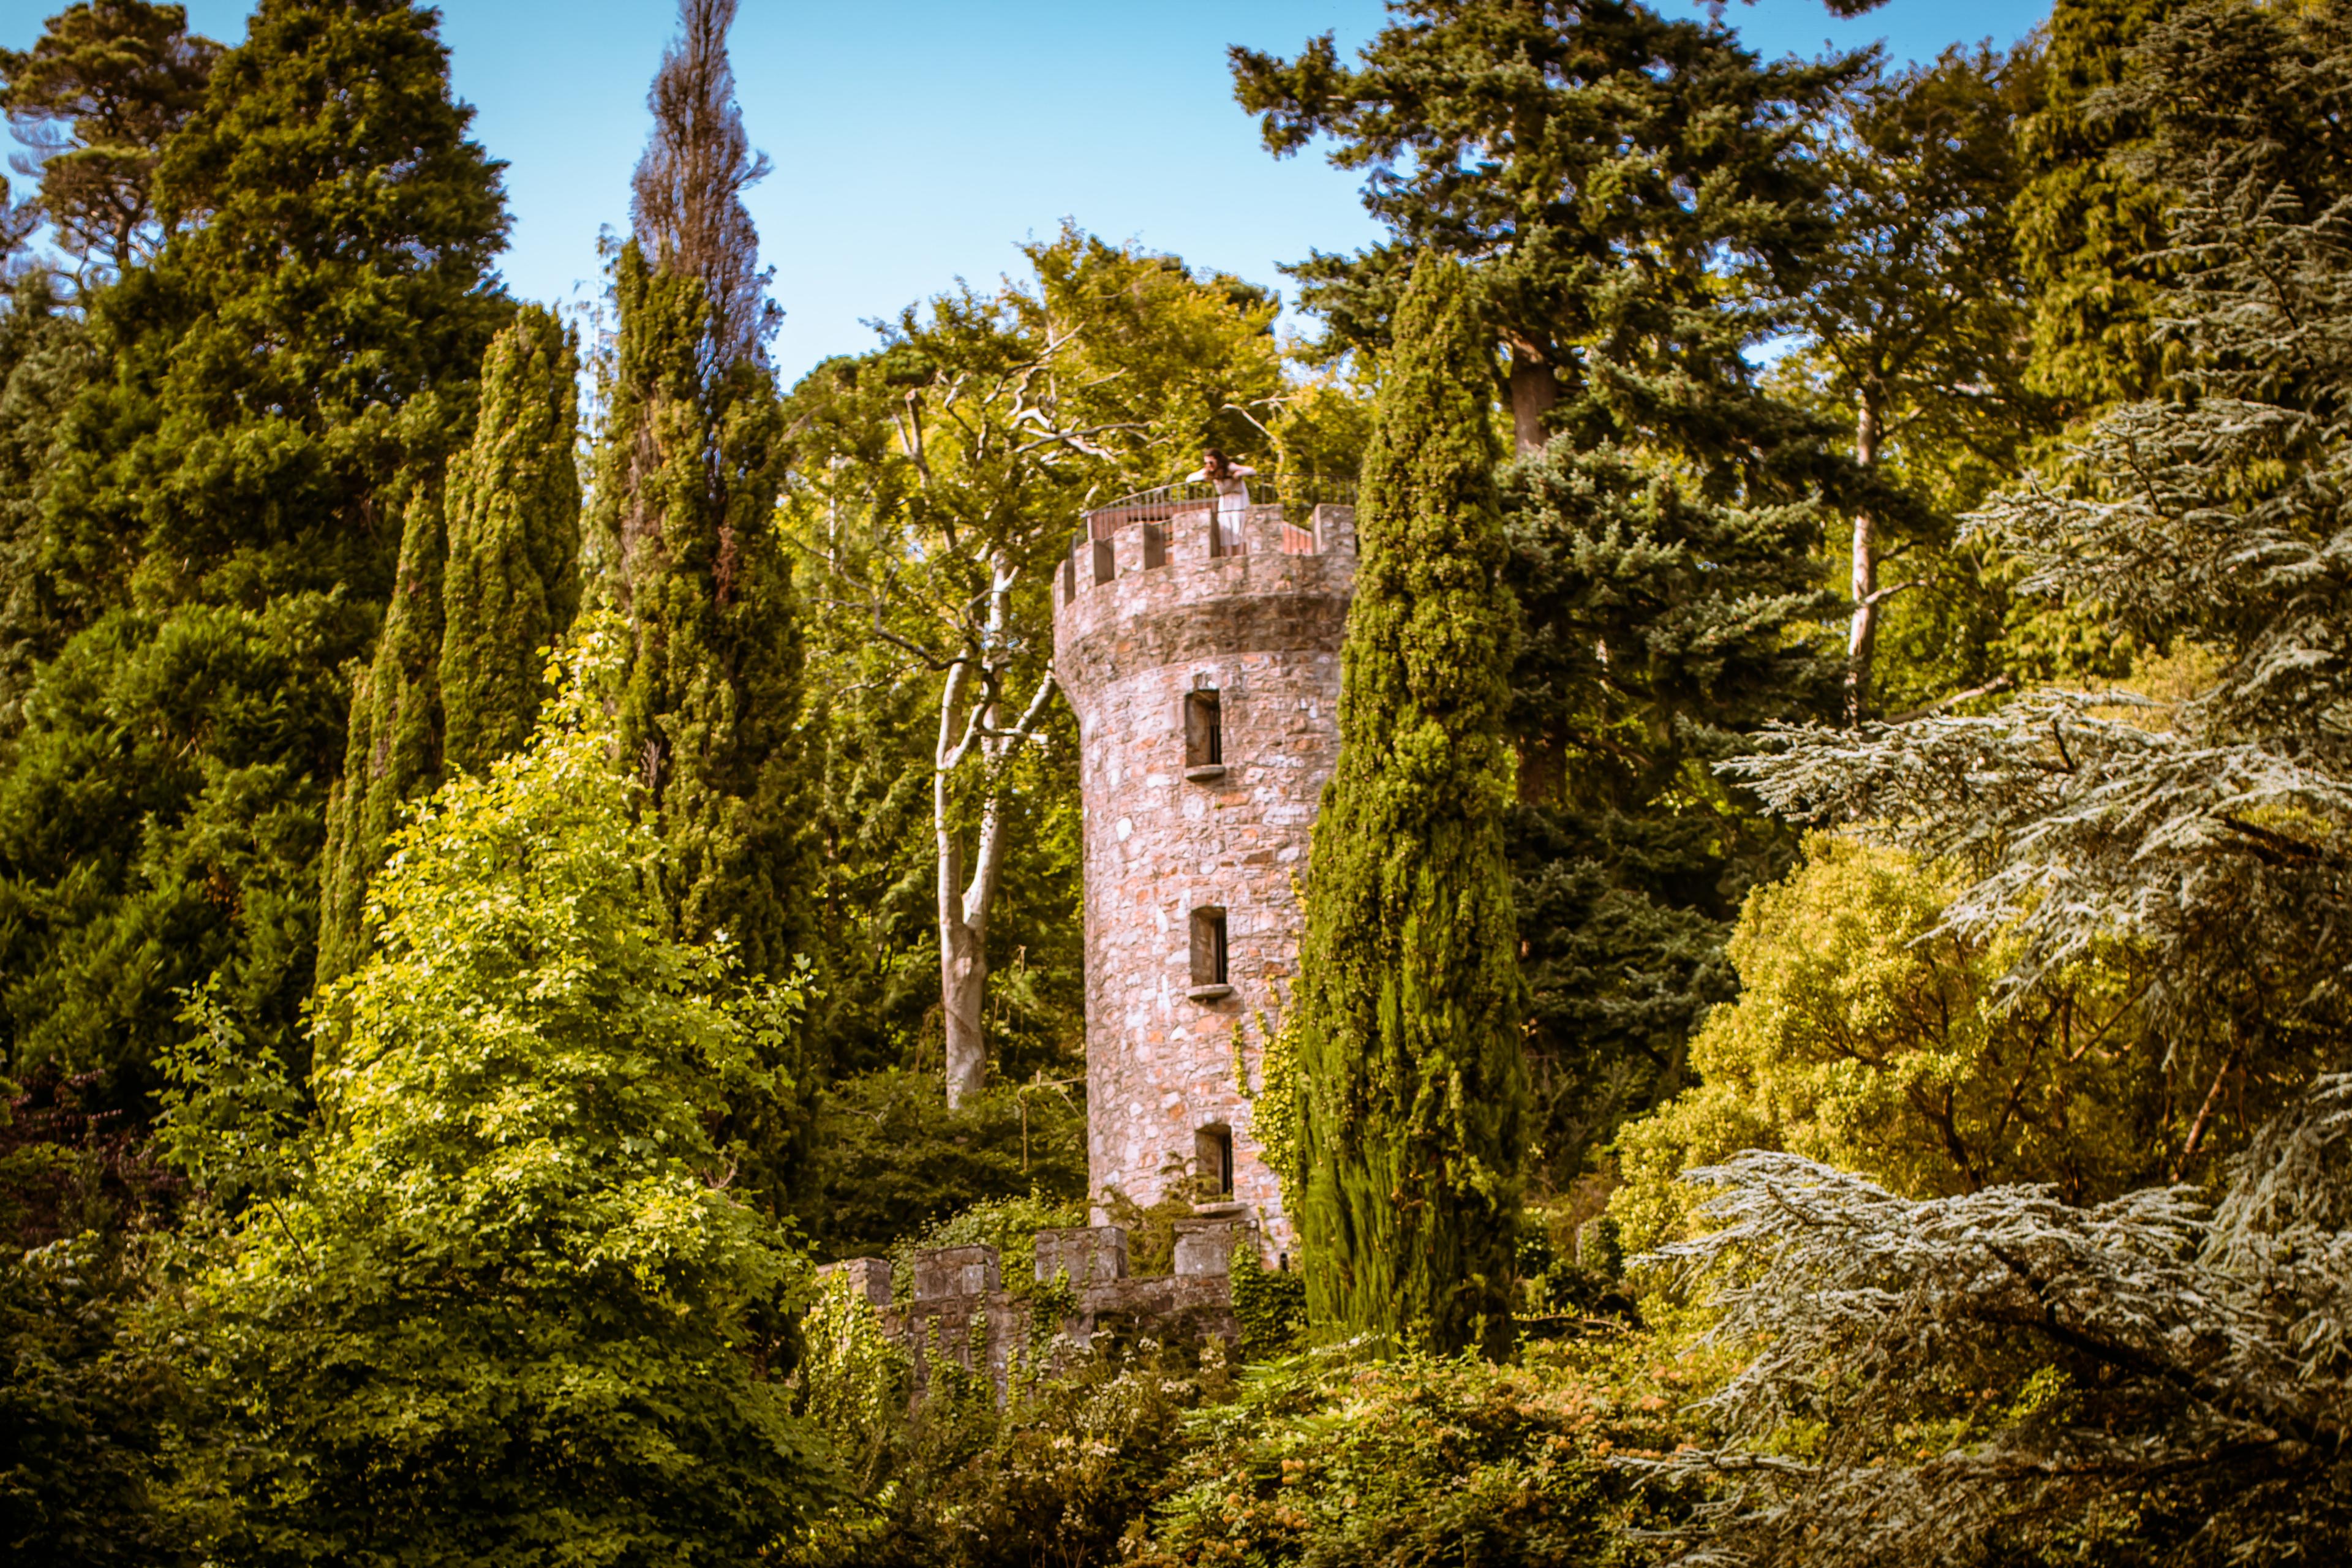 Wicklow Ireland  city pictures gallery : Description Powerscourt Estate Tower, Co. Wicklow, Ireland 2012